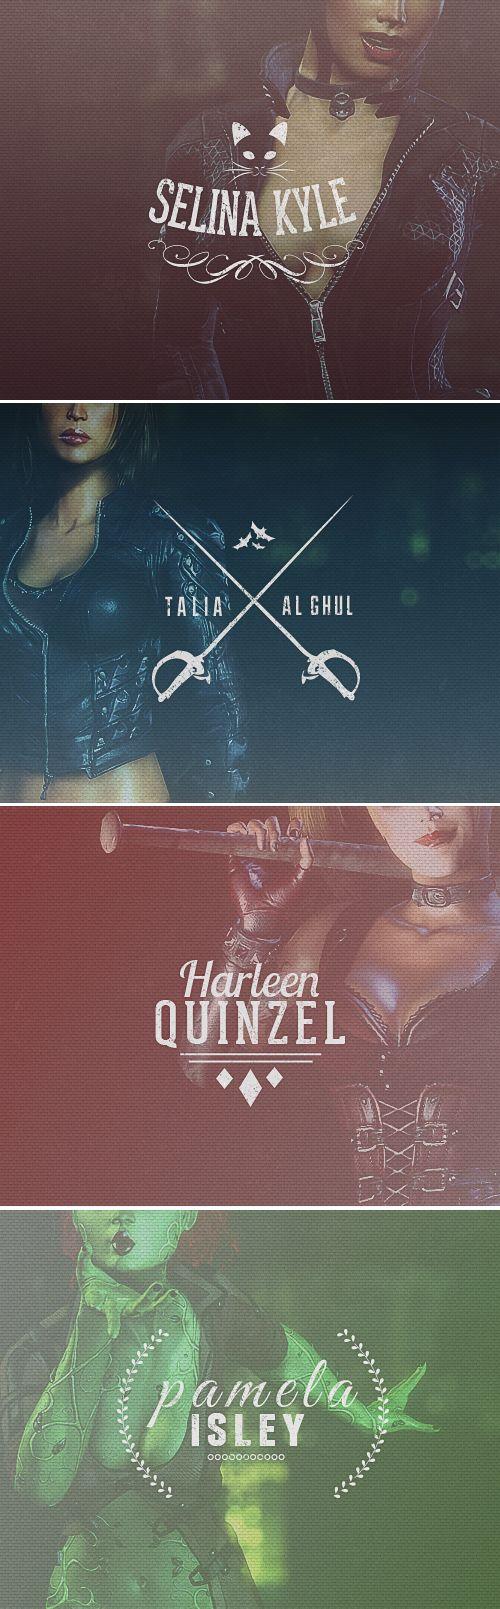 Batman: Arkham City: Selina Kyle. Talia al'Ghul. Harleen Quinzel. Pamela Isley.